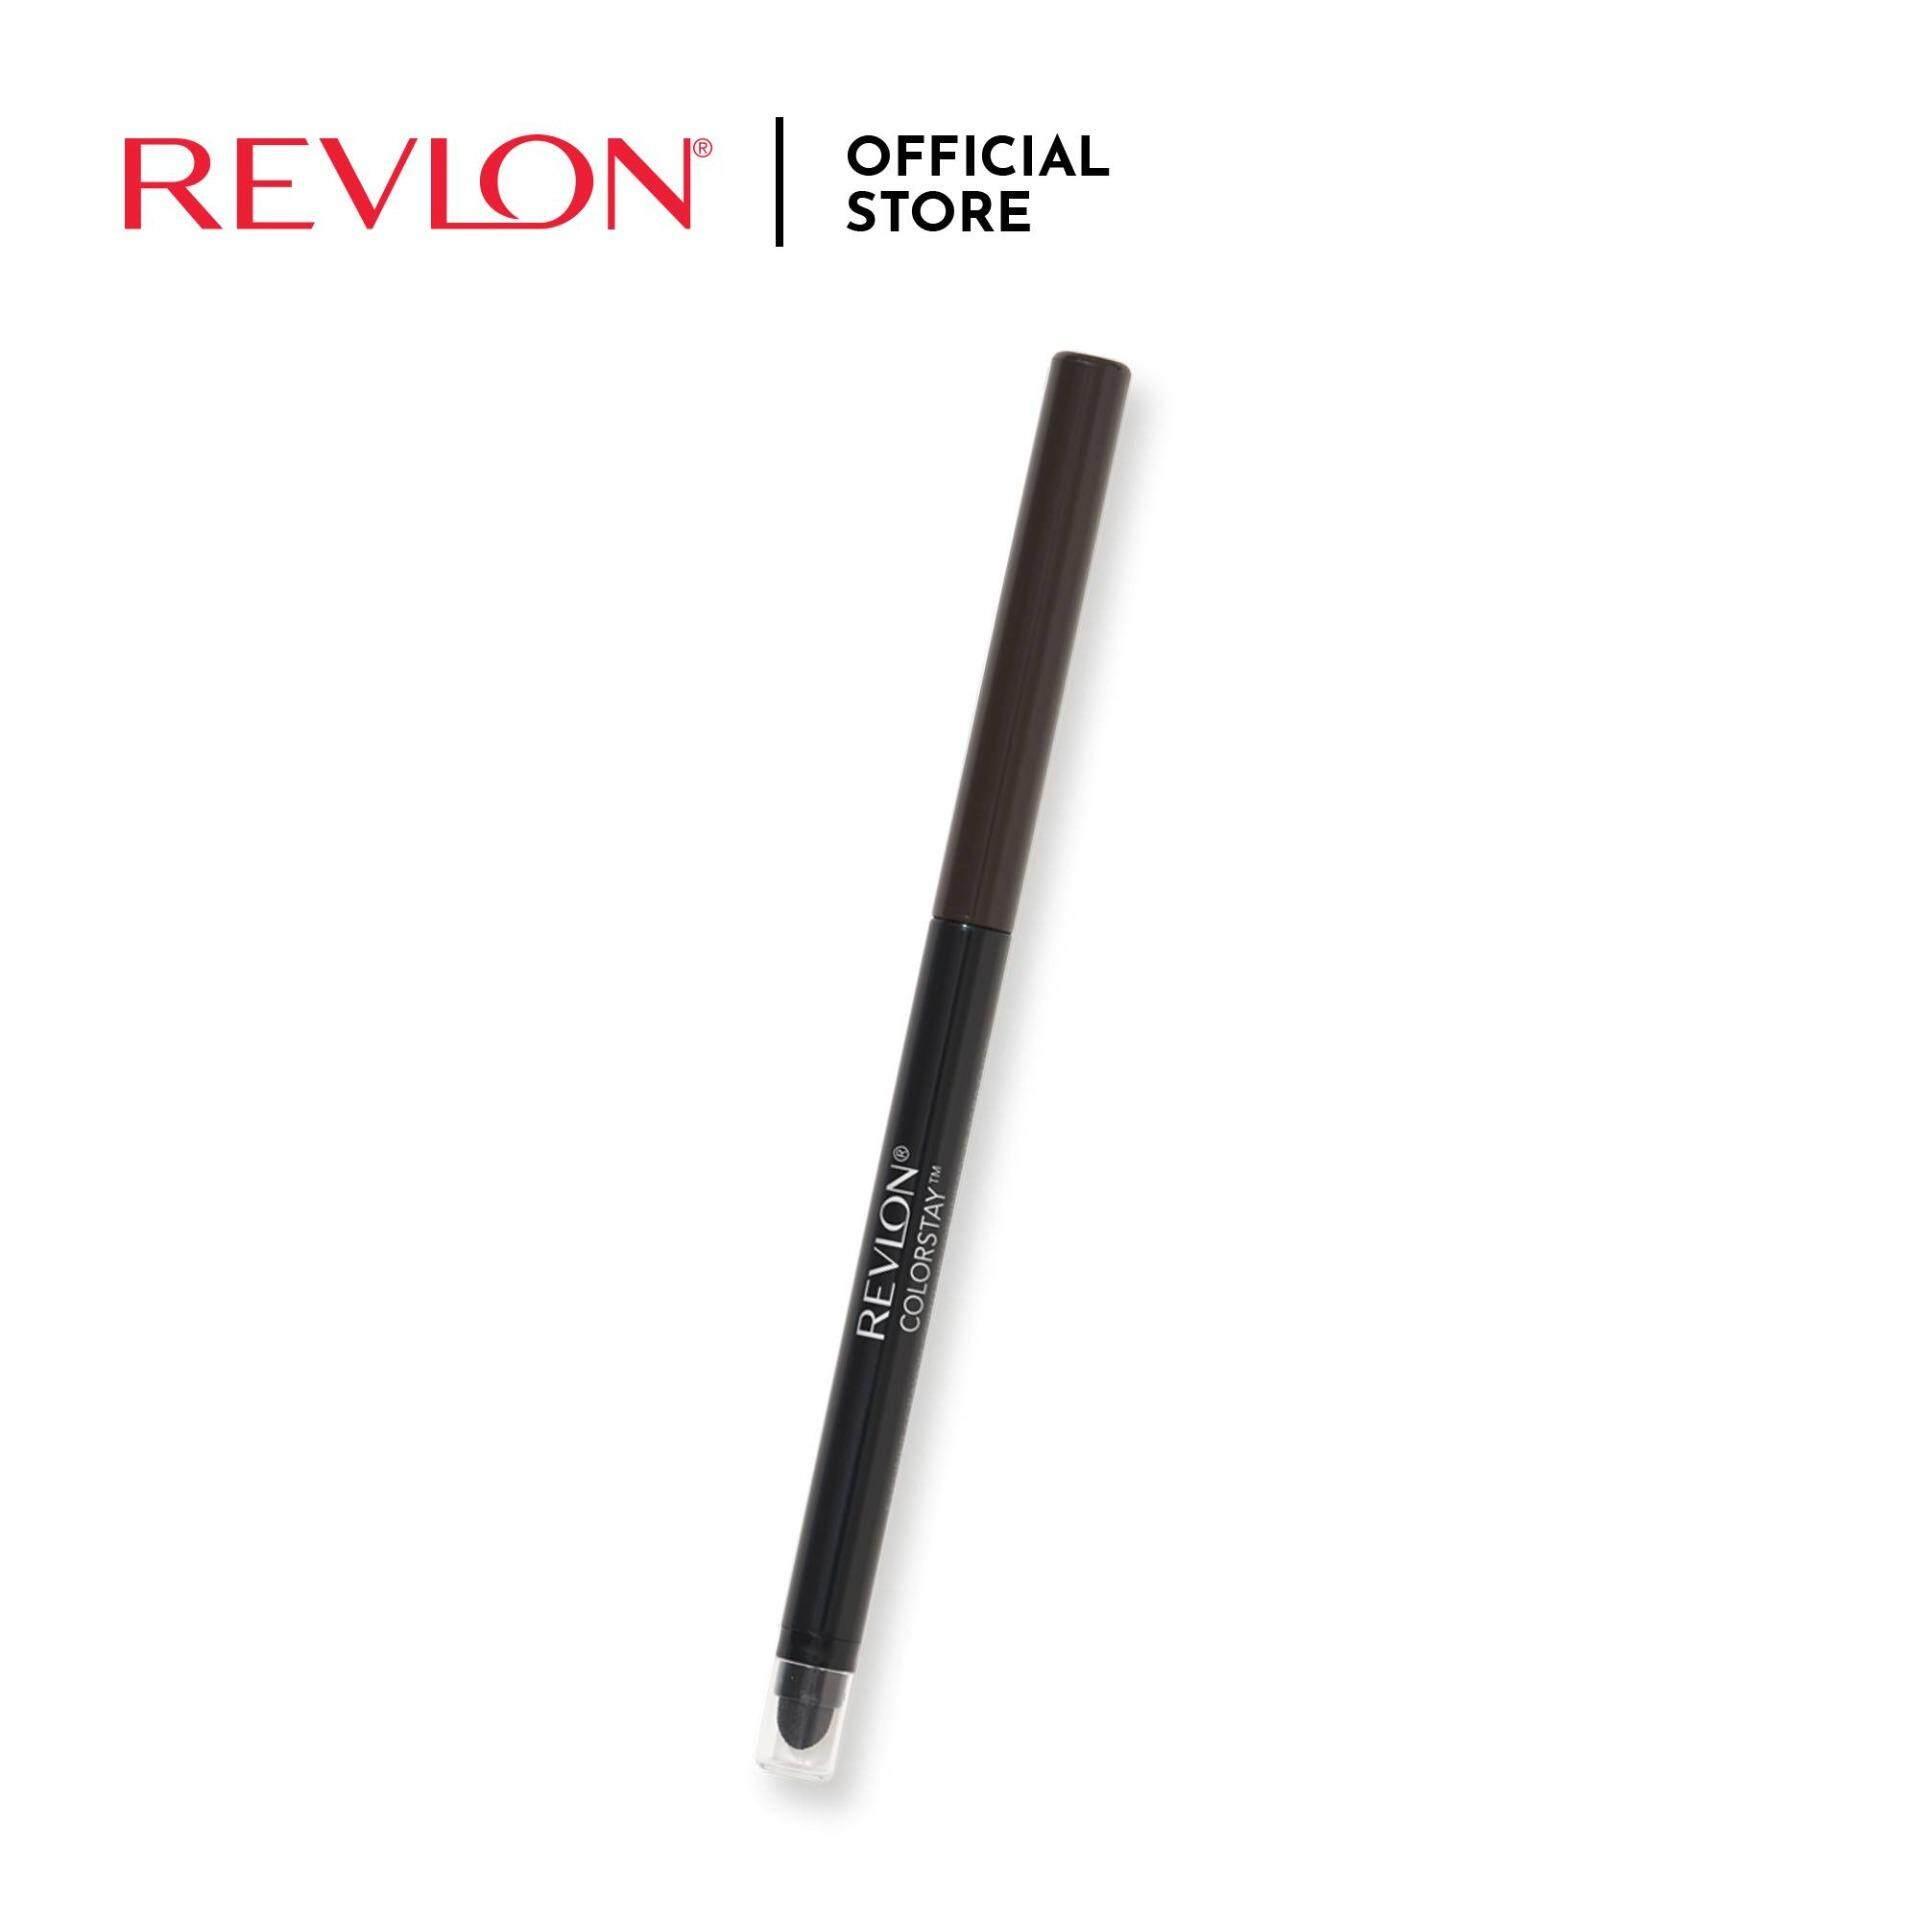 Revlon Colorstay Eye Liner - Black Brown